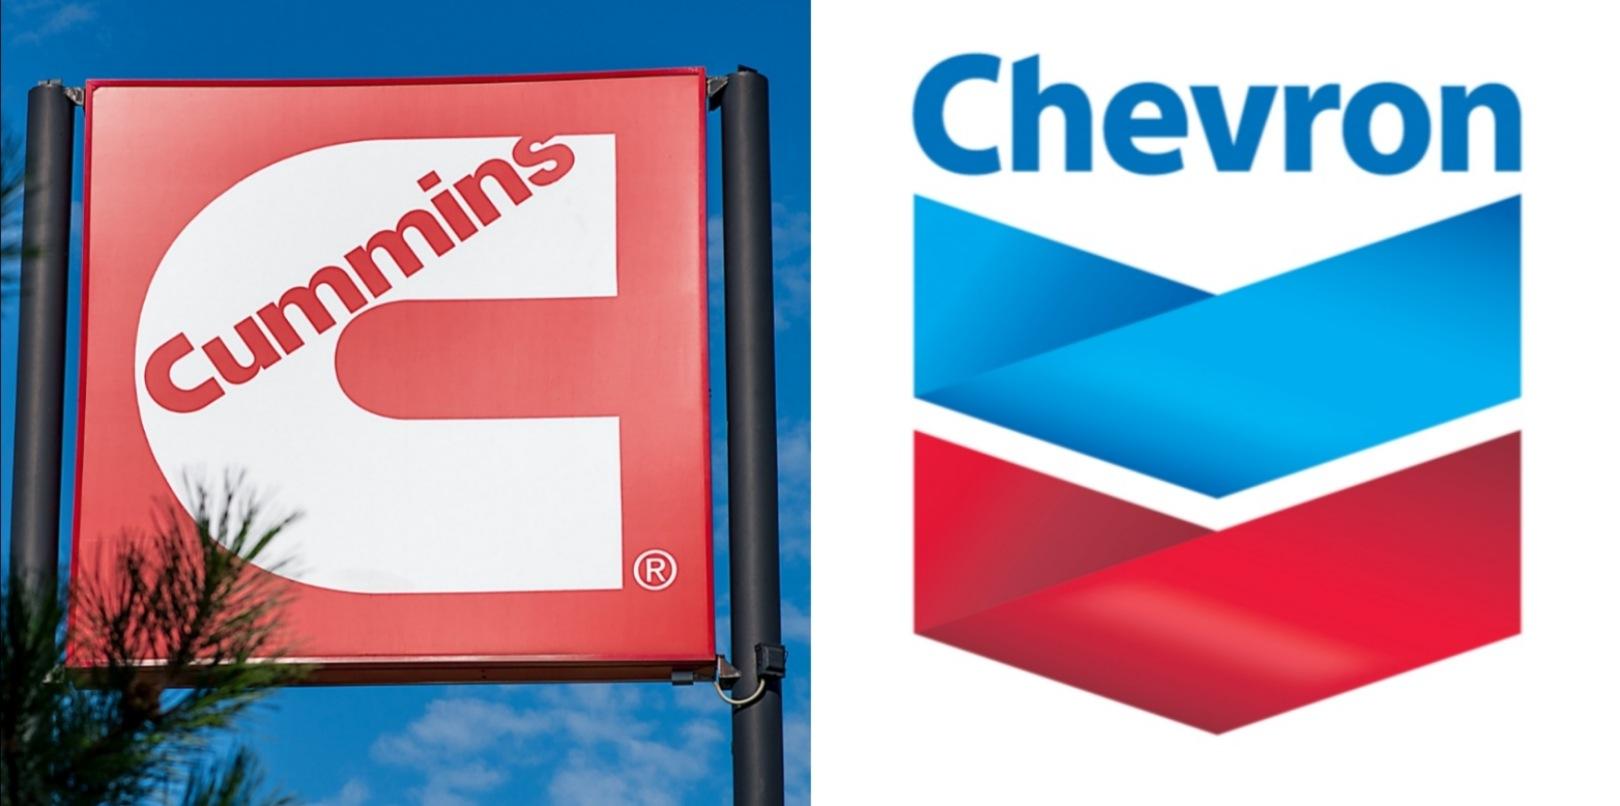 Cummins Chevron